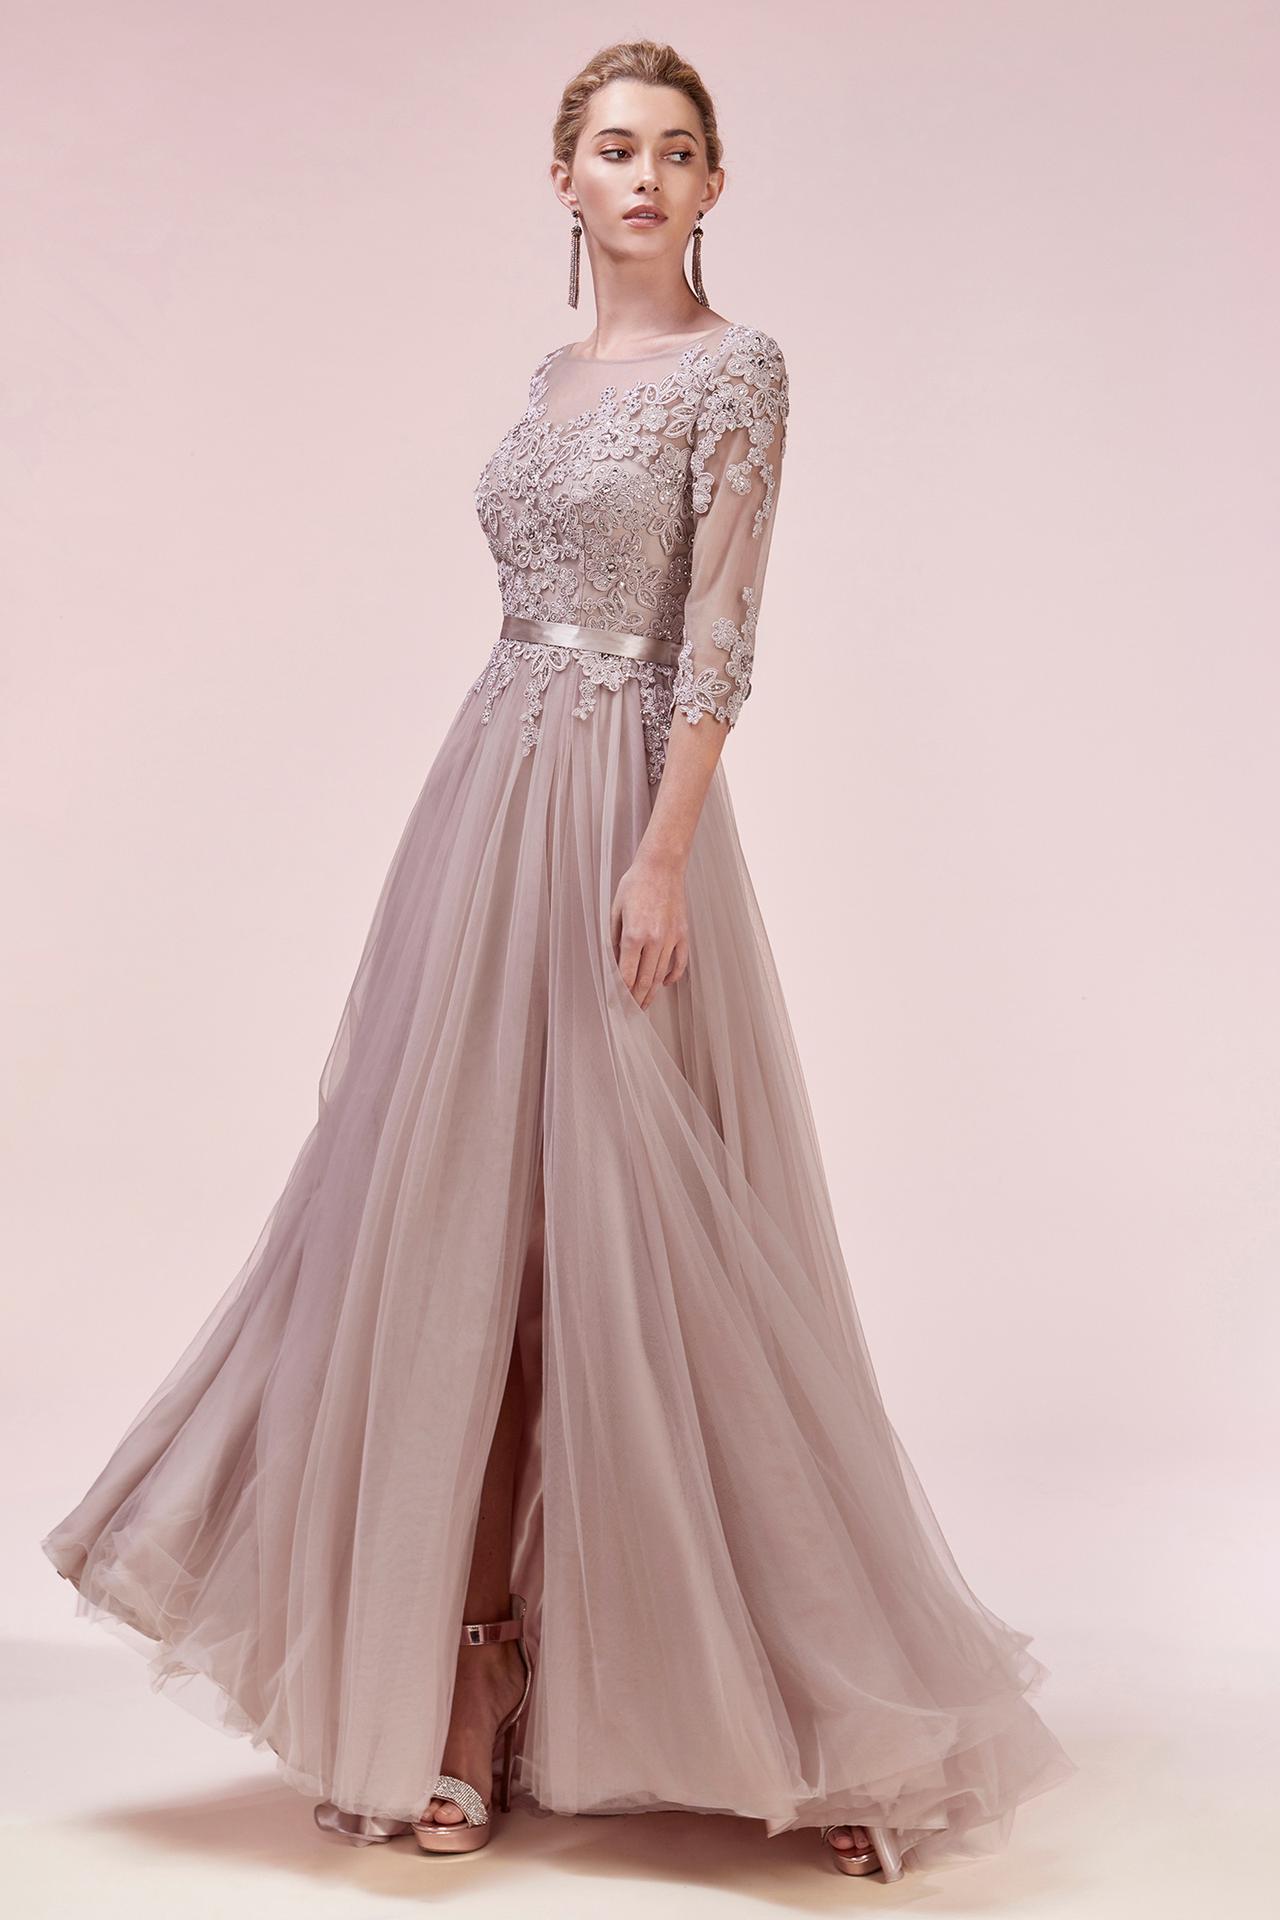 Nové spoločenské šaty :) - Obrázok č. 24